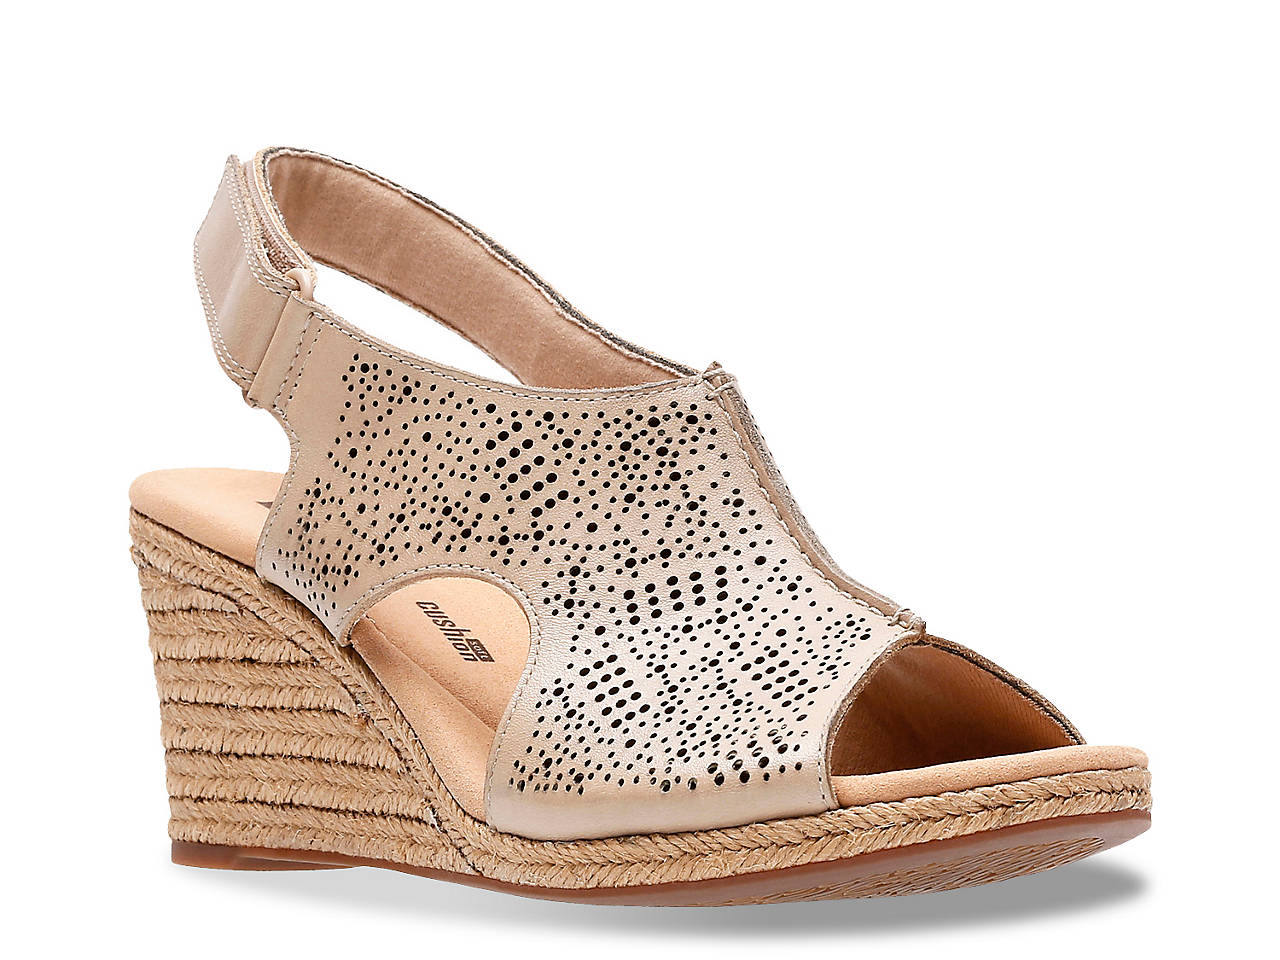 ea05b9960bd Lafley Rosen Espadrille Wedge Sandal